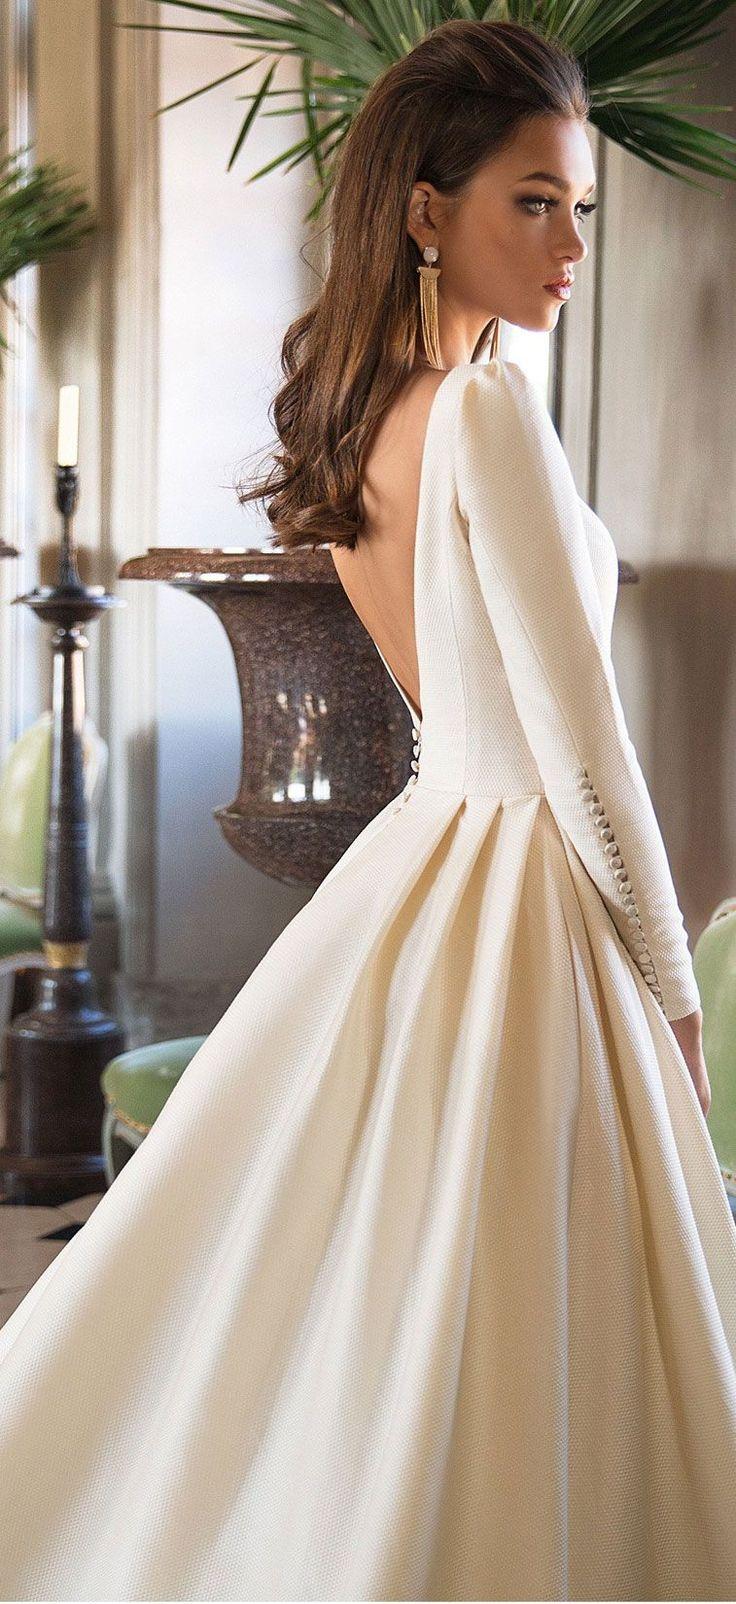 Long sleeves simple a line wedding dress : Milla Nova wedding dress #weddingdress #weddinggown #wedding #bridedress